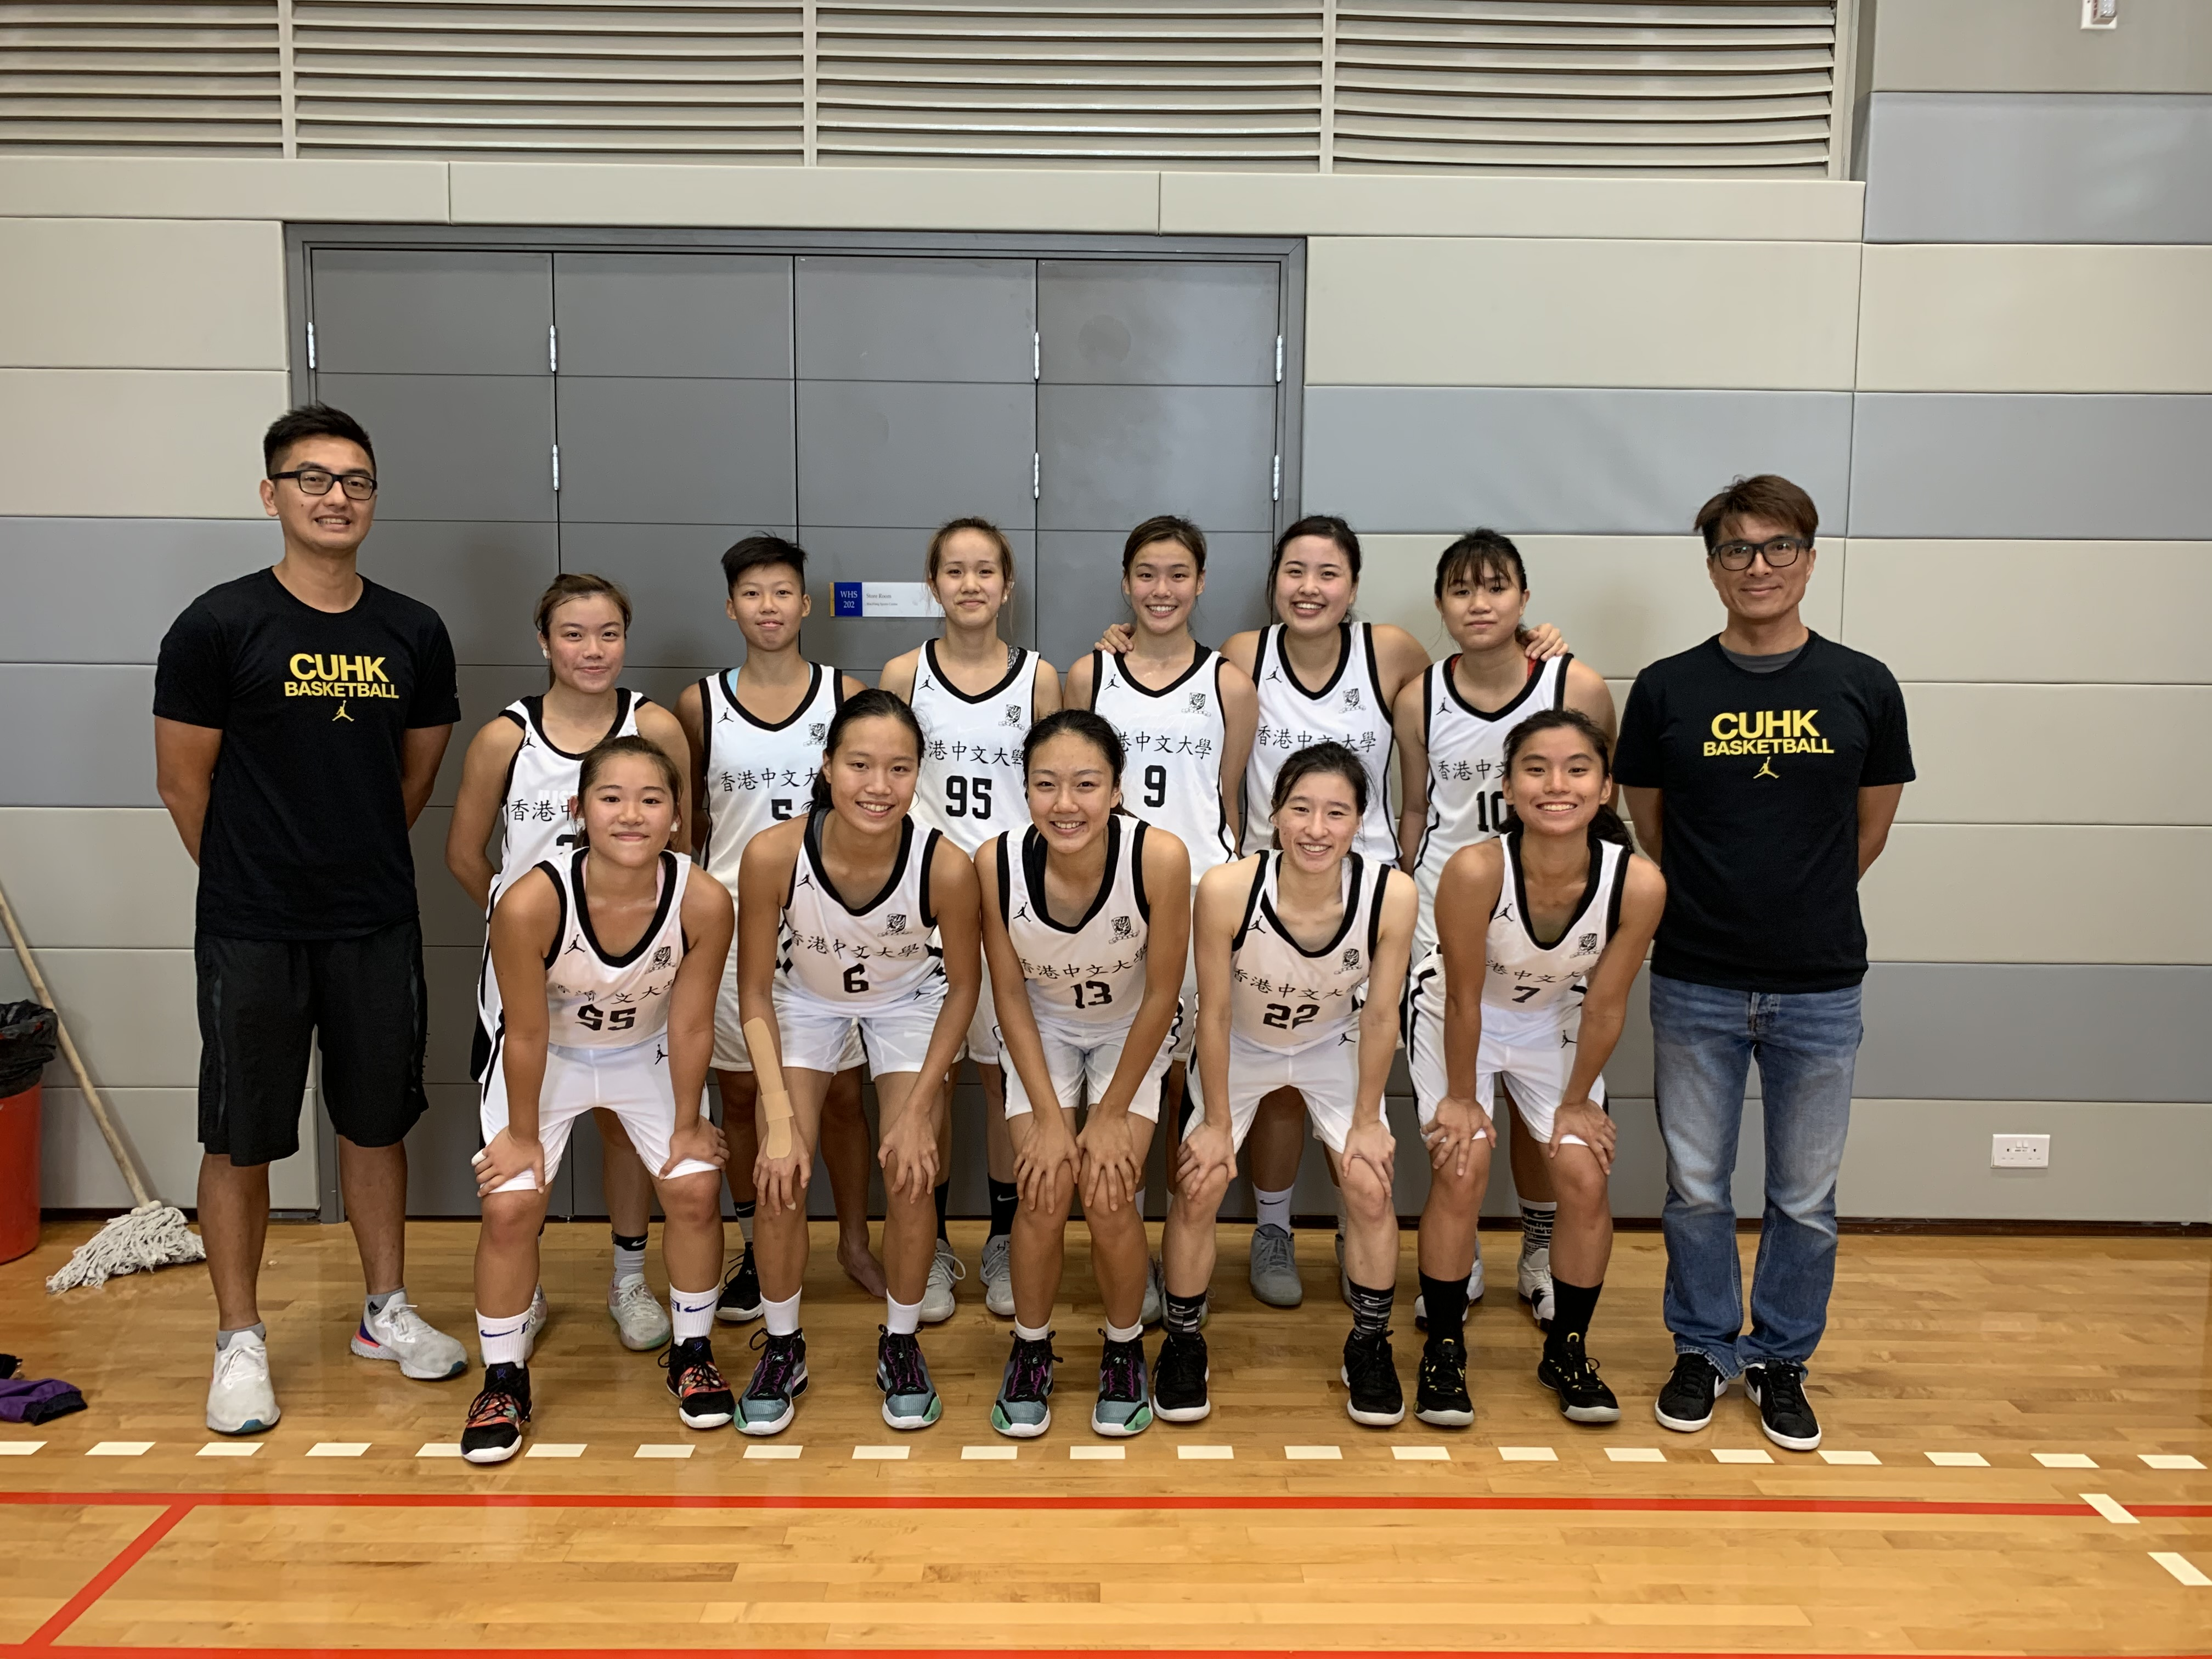 Basketball girls 2019 2020